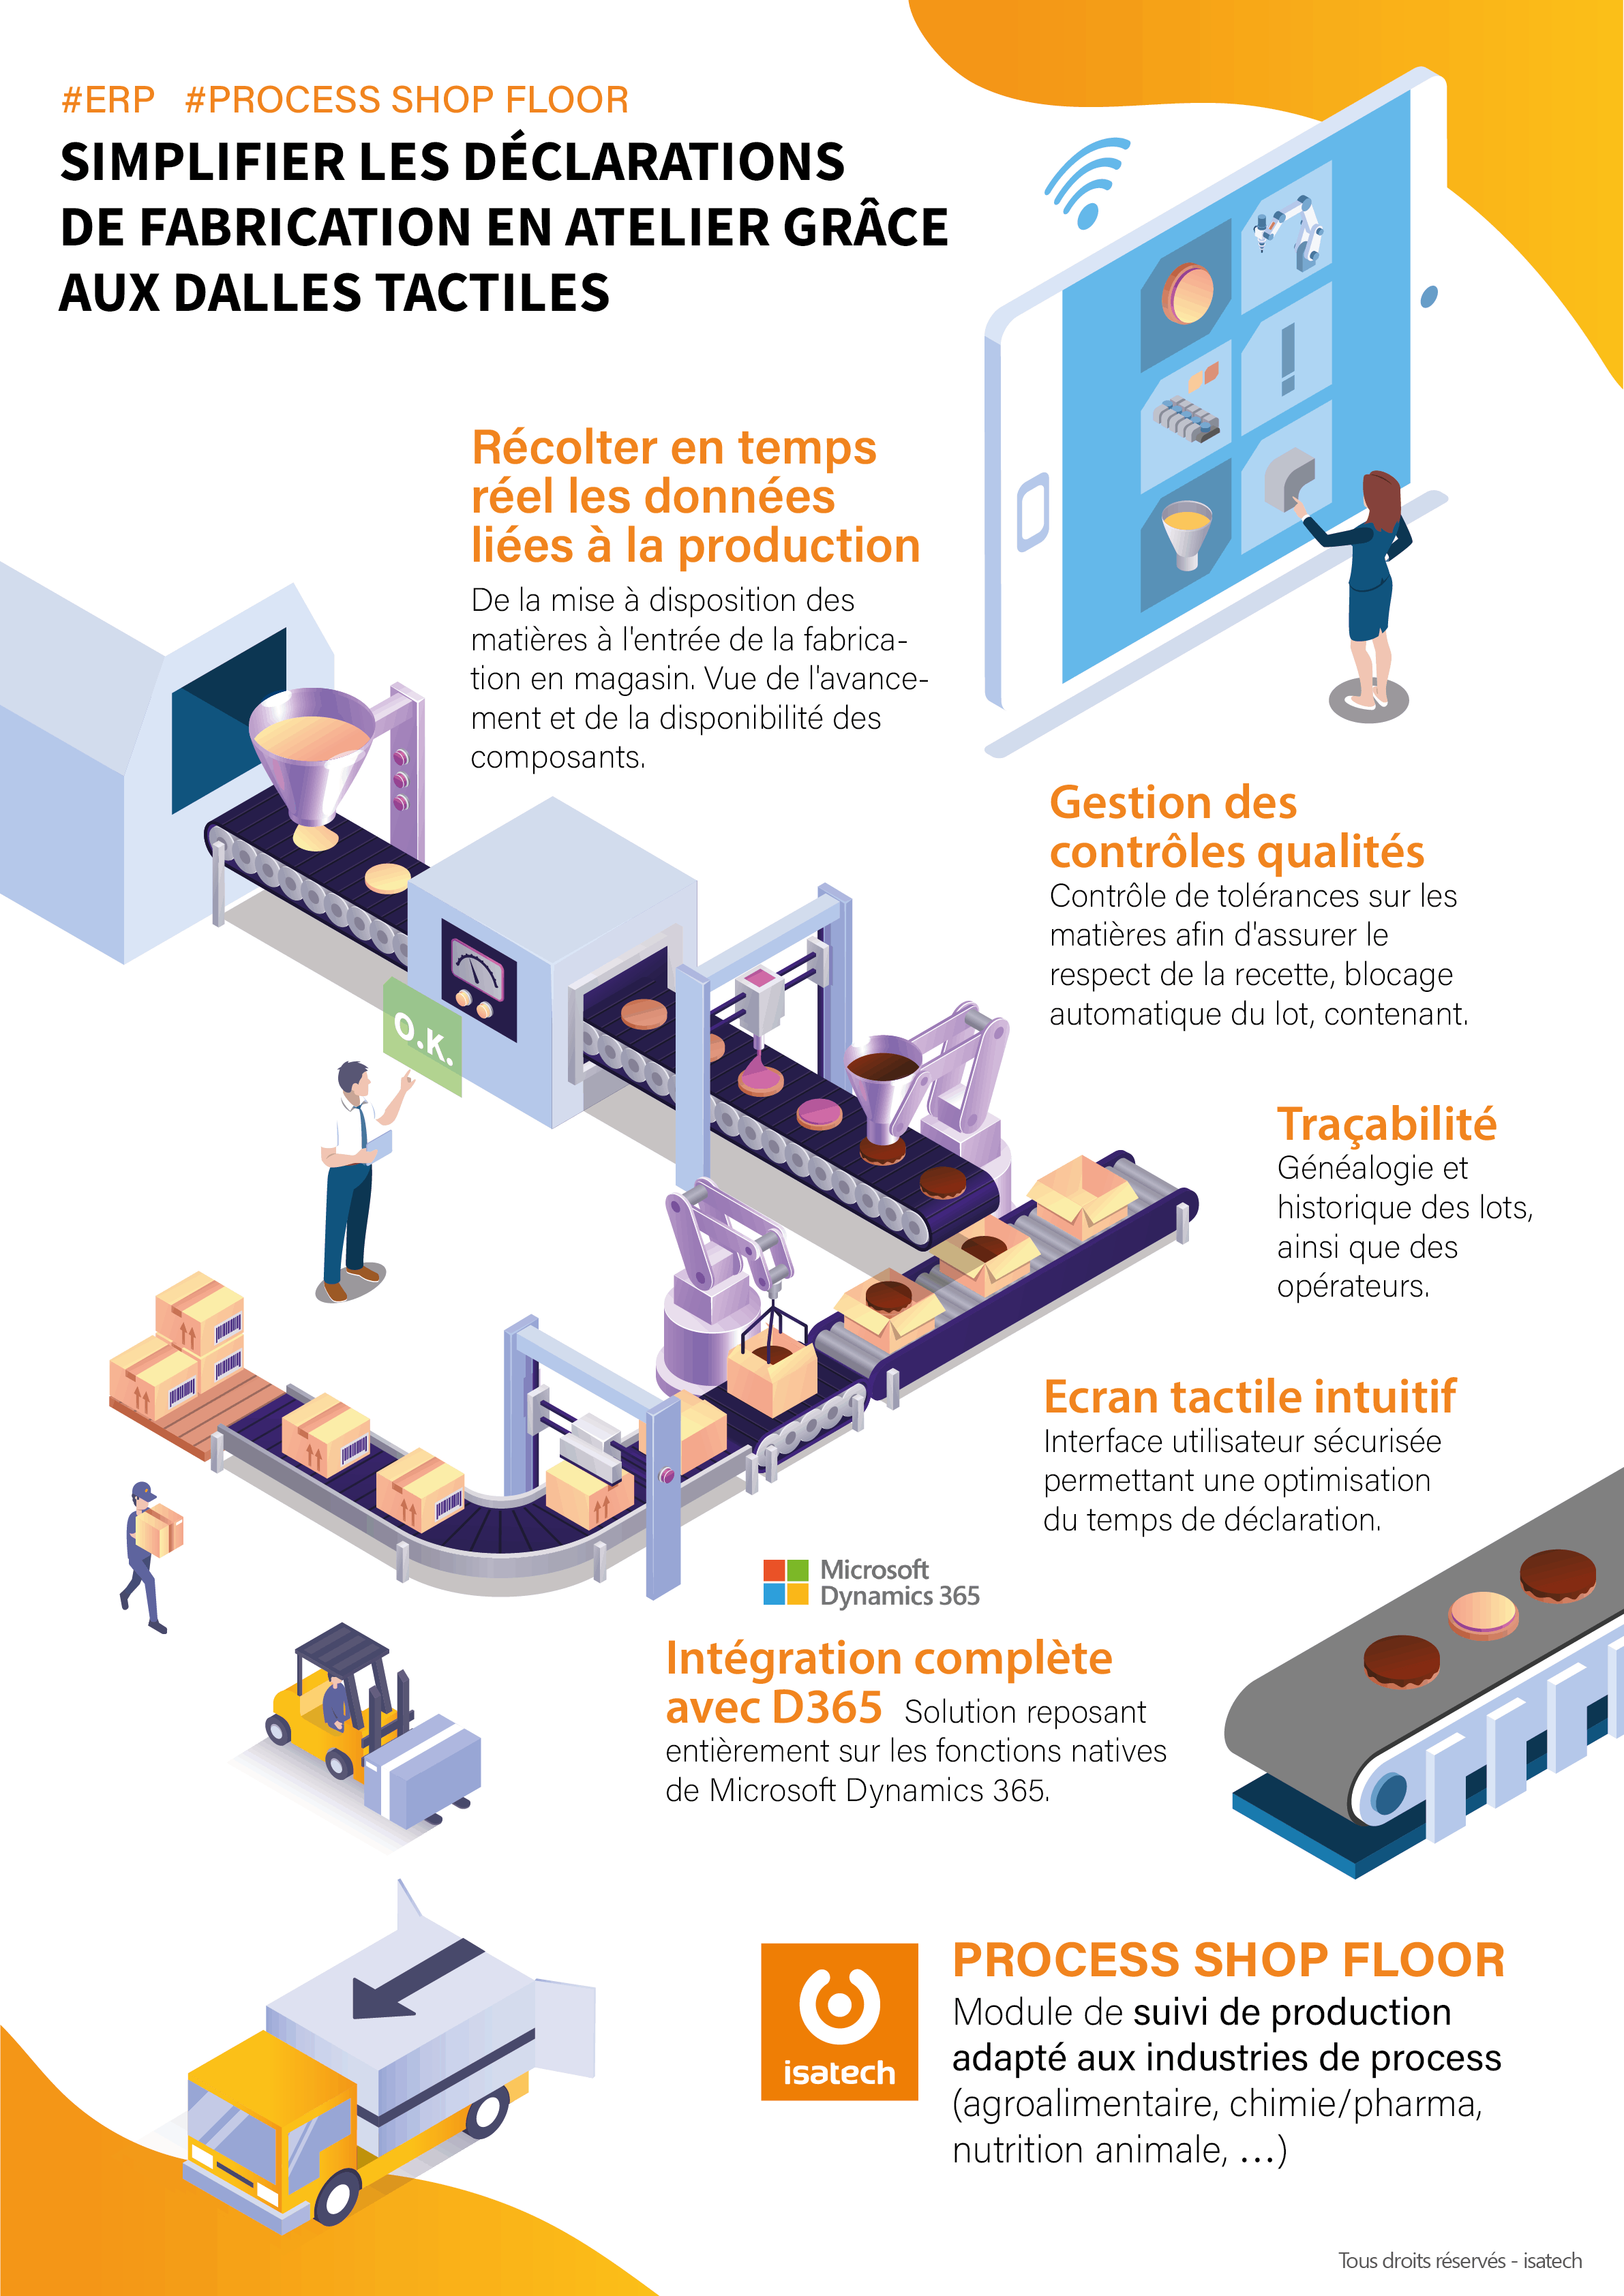 Process Shop Floor